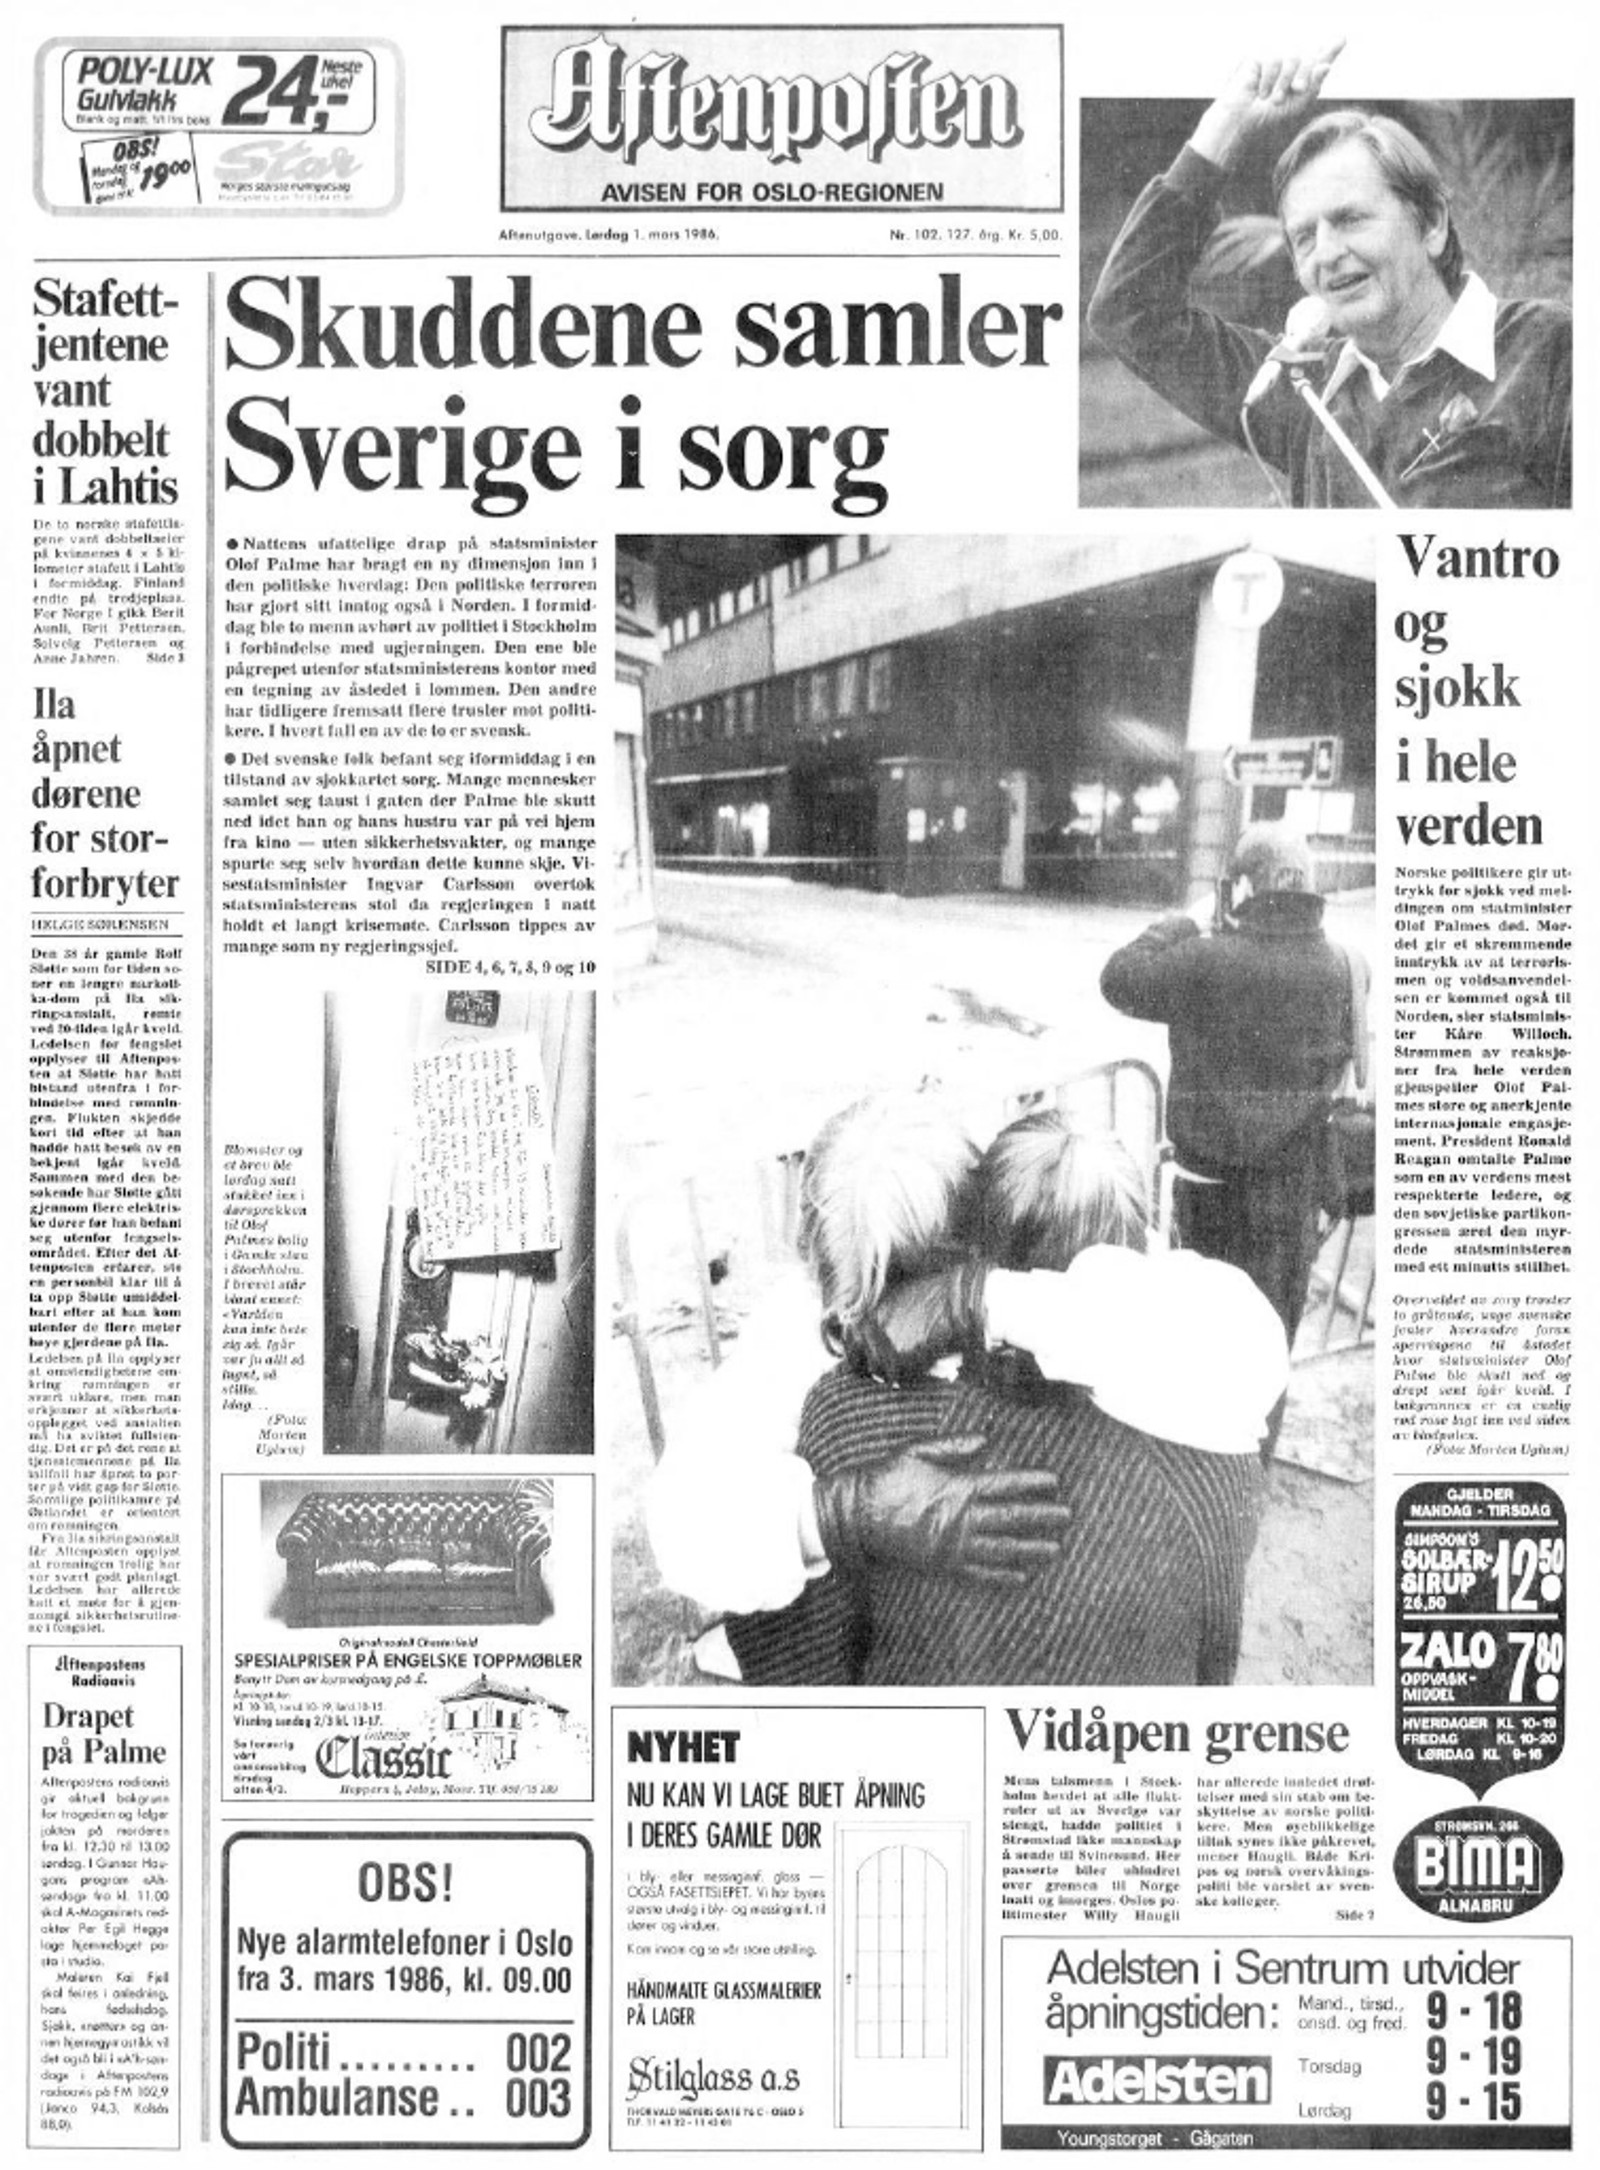 Aftenpostens forside 1. mars 1986